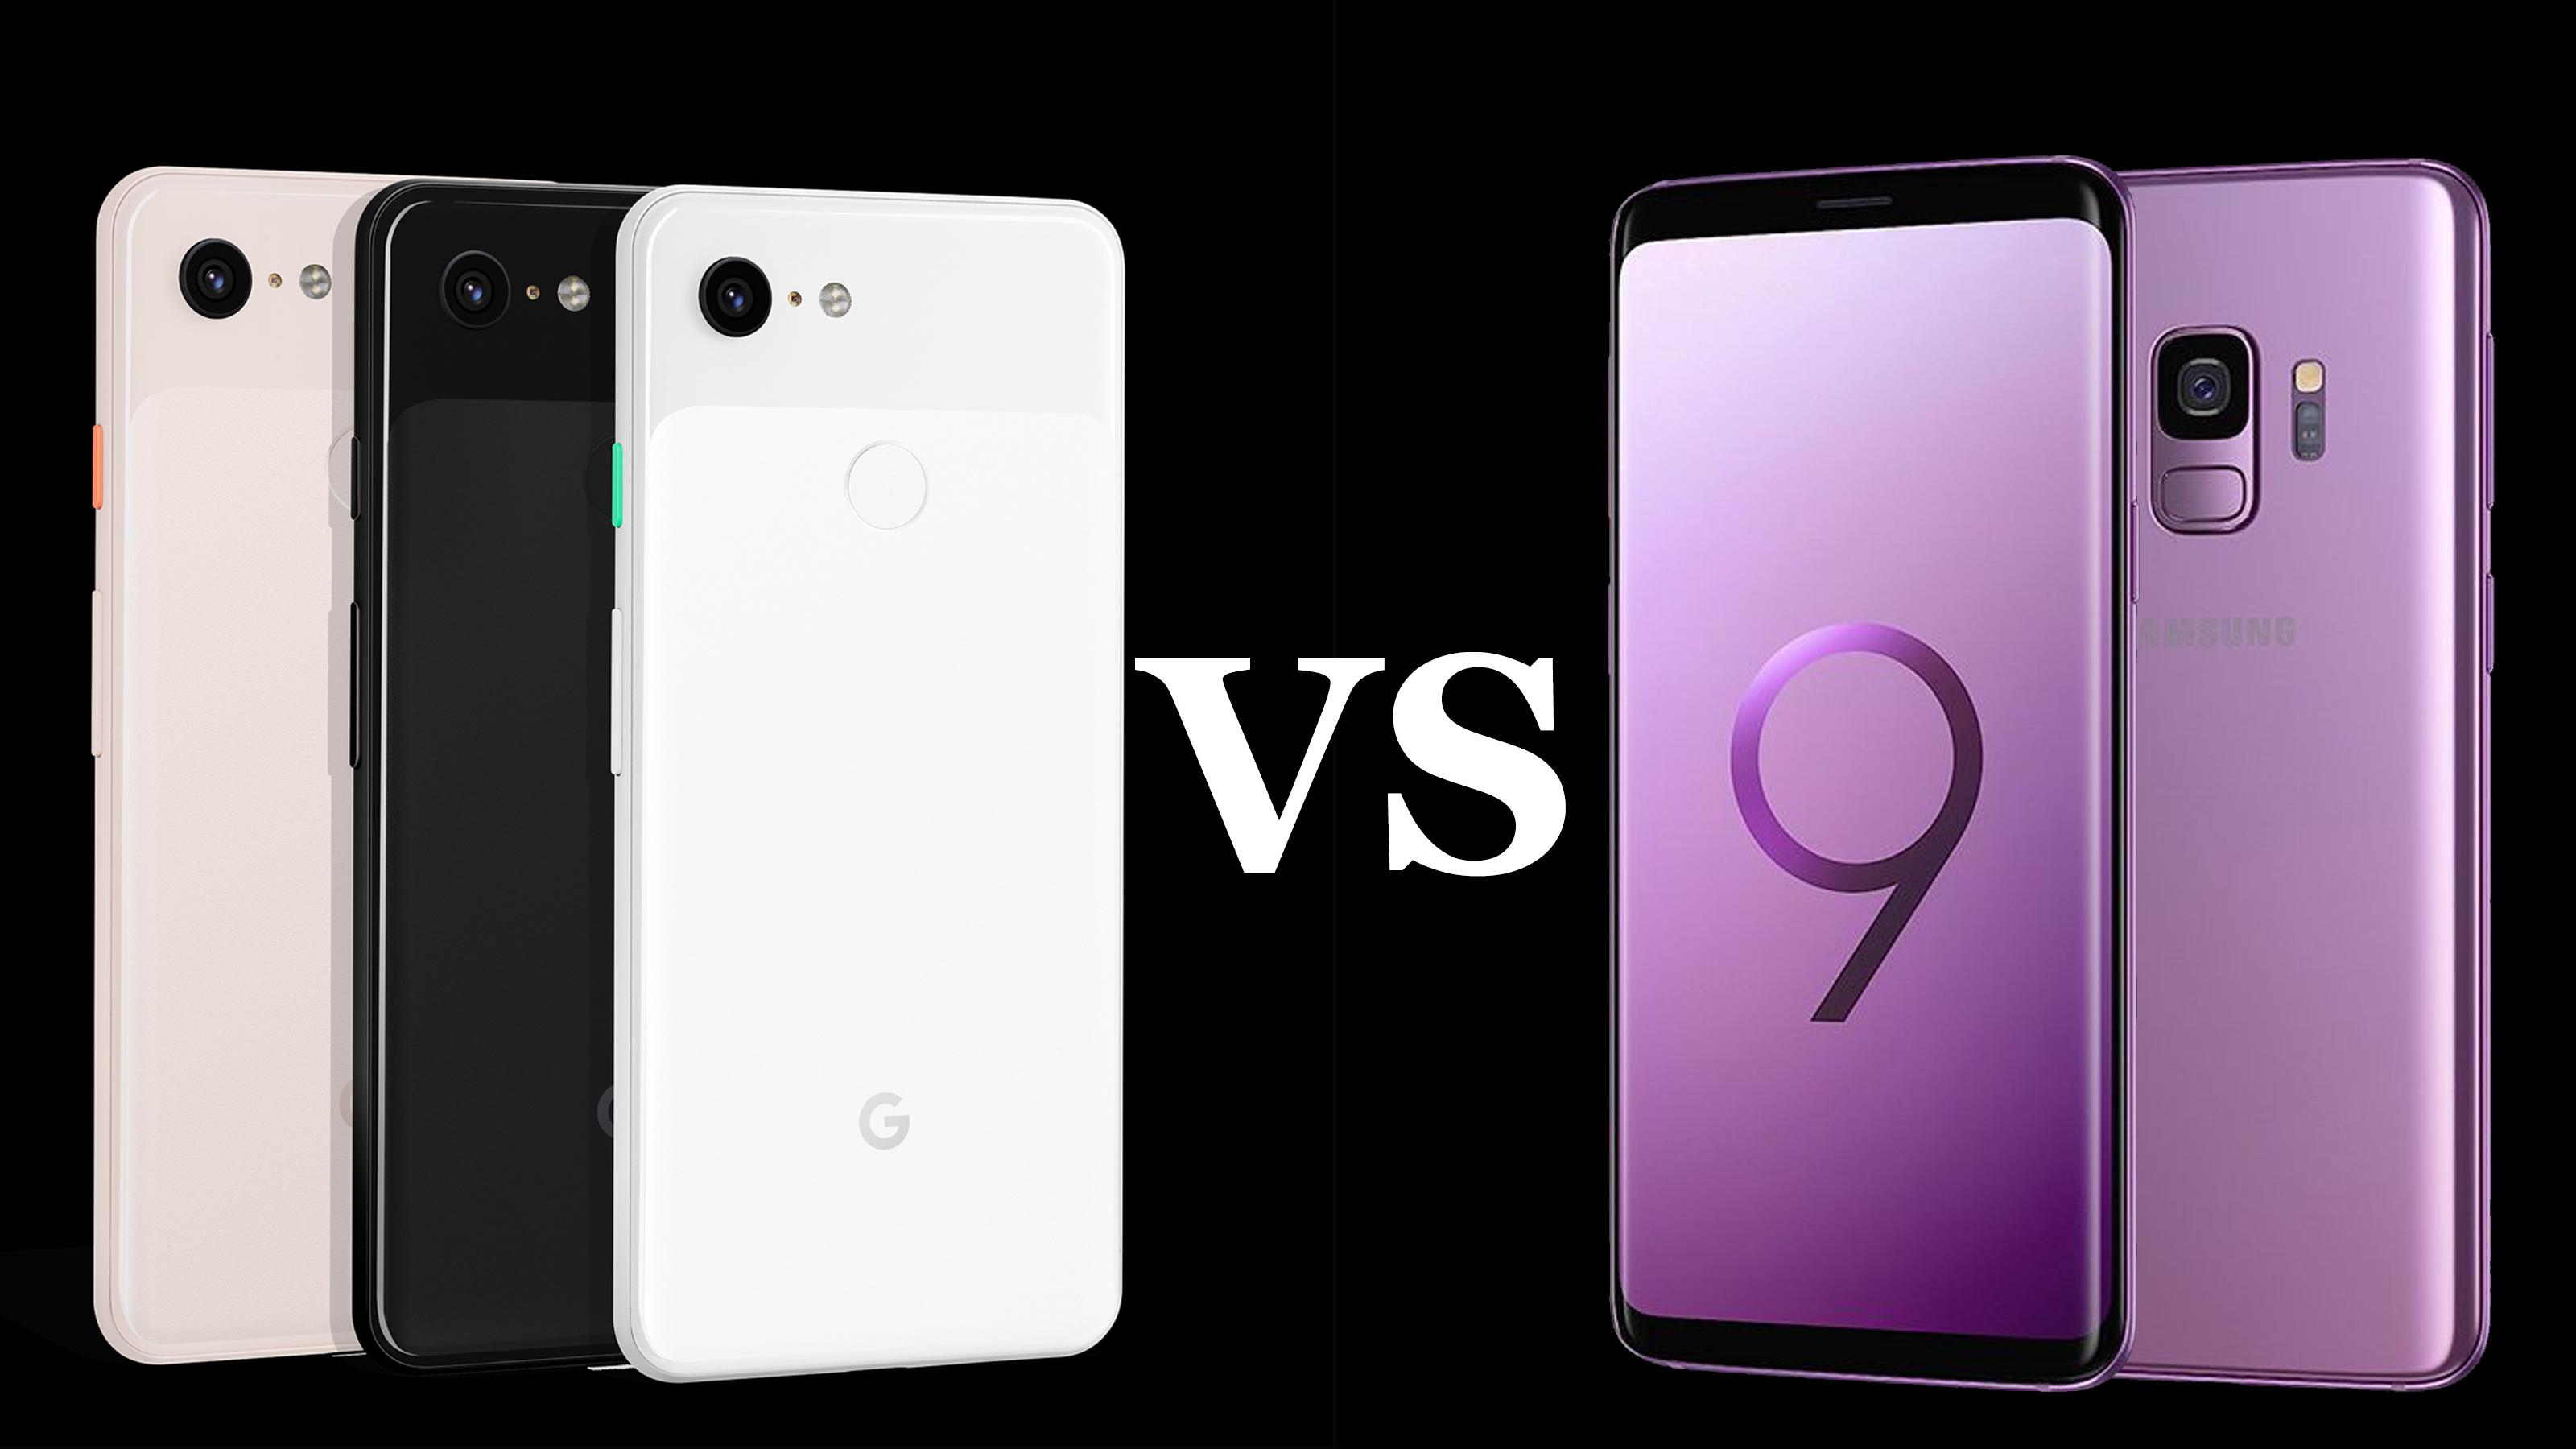 Google Pixel 3 vs Samsung Galaxy S9